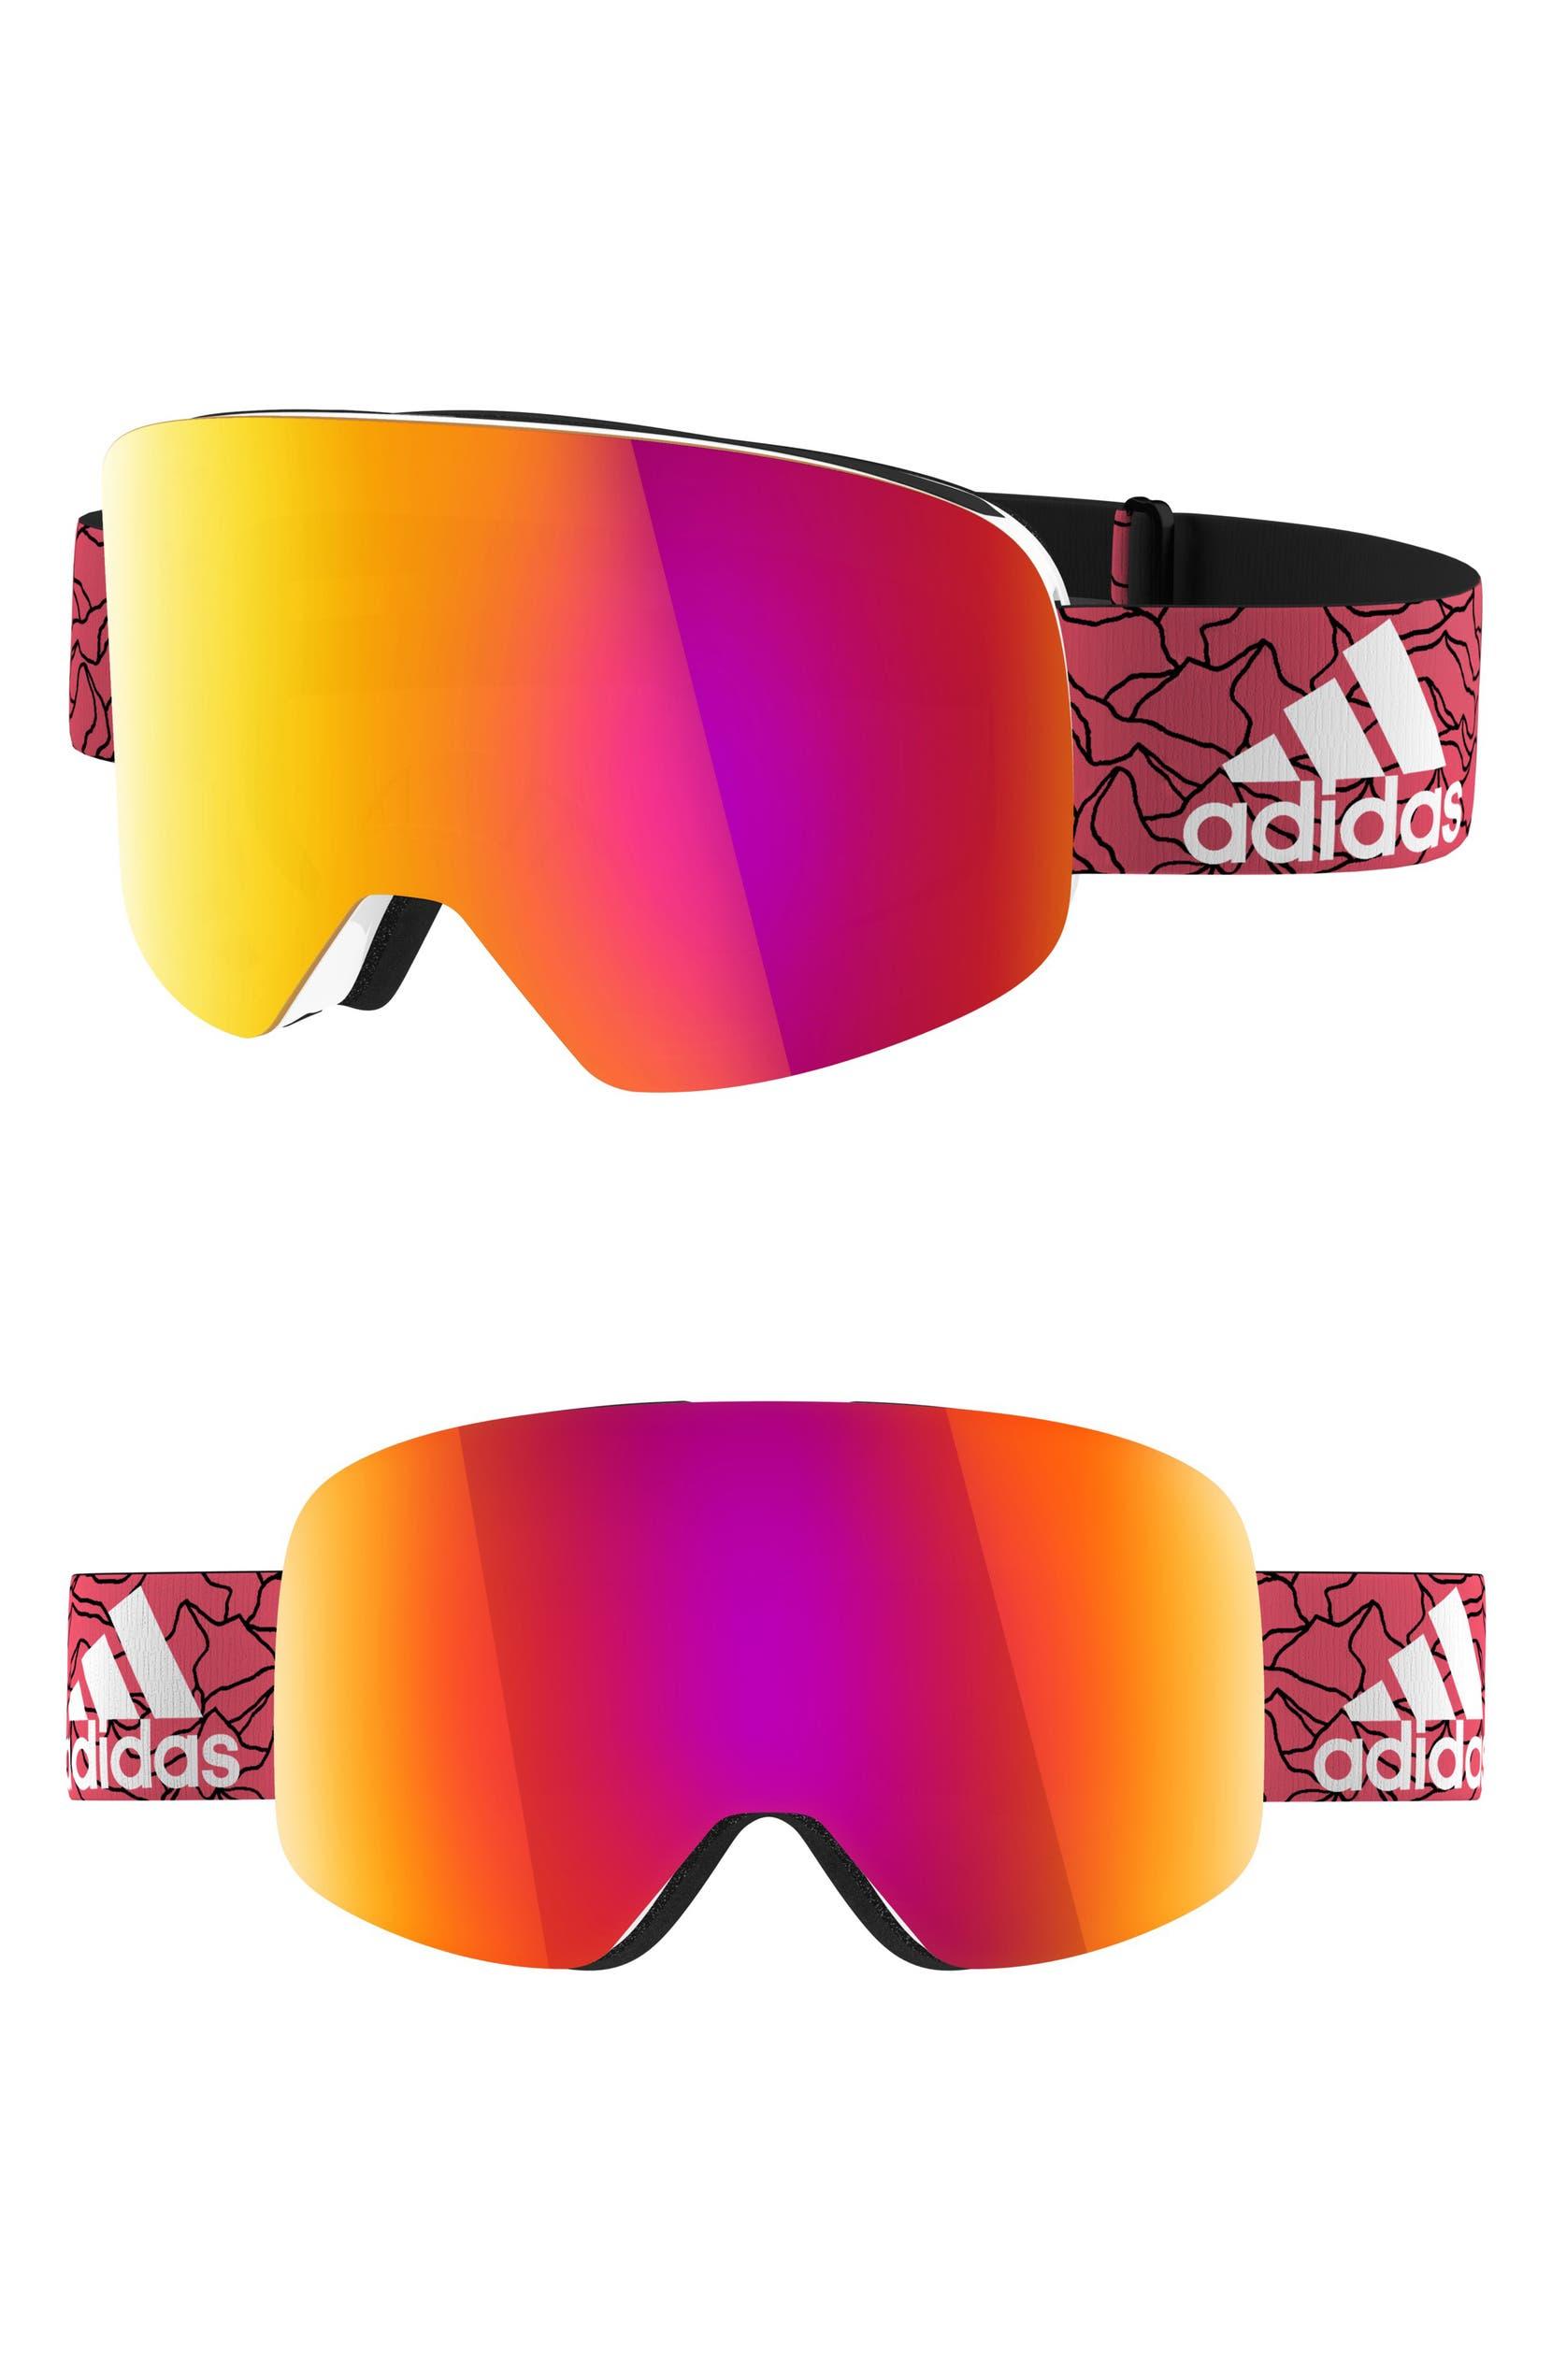 Adidas Eyewear Backland Black Matt